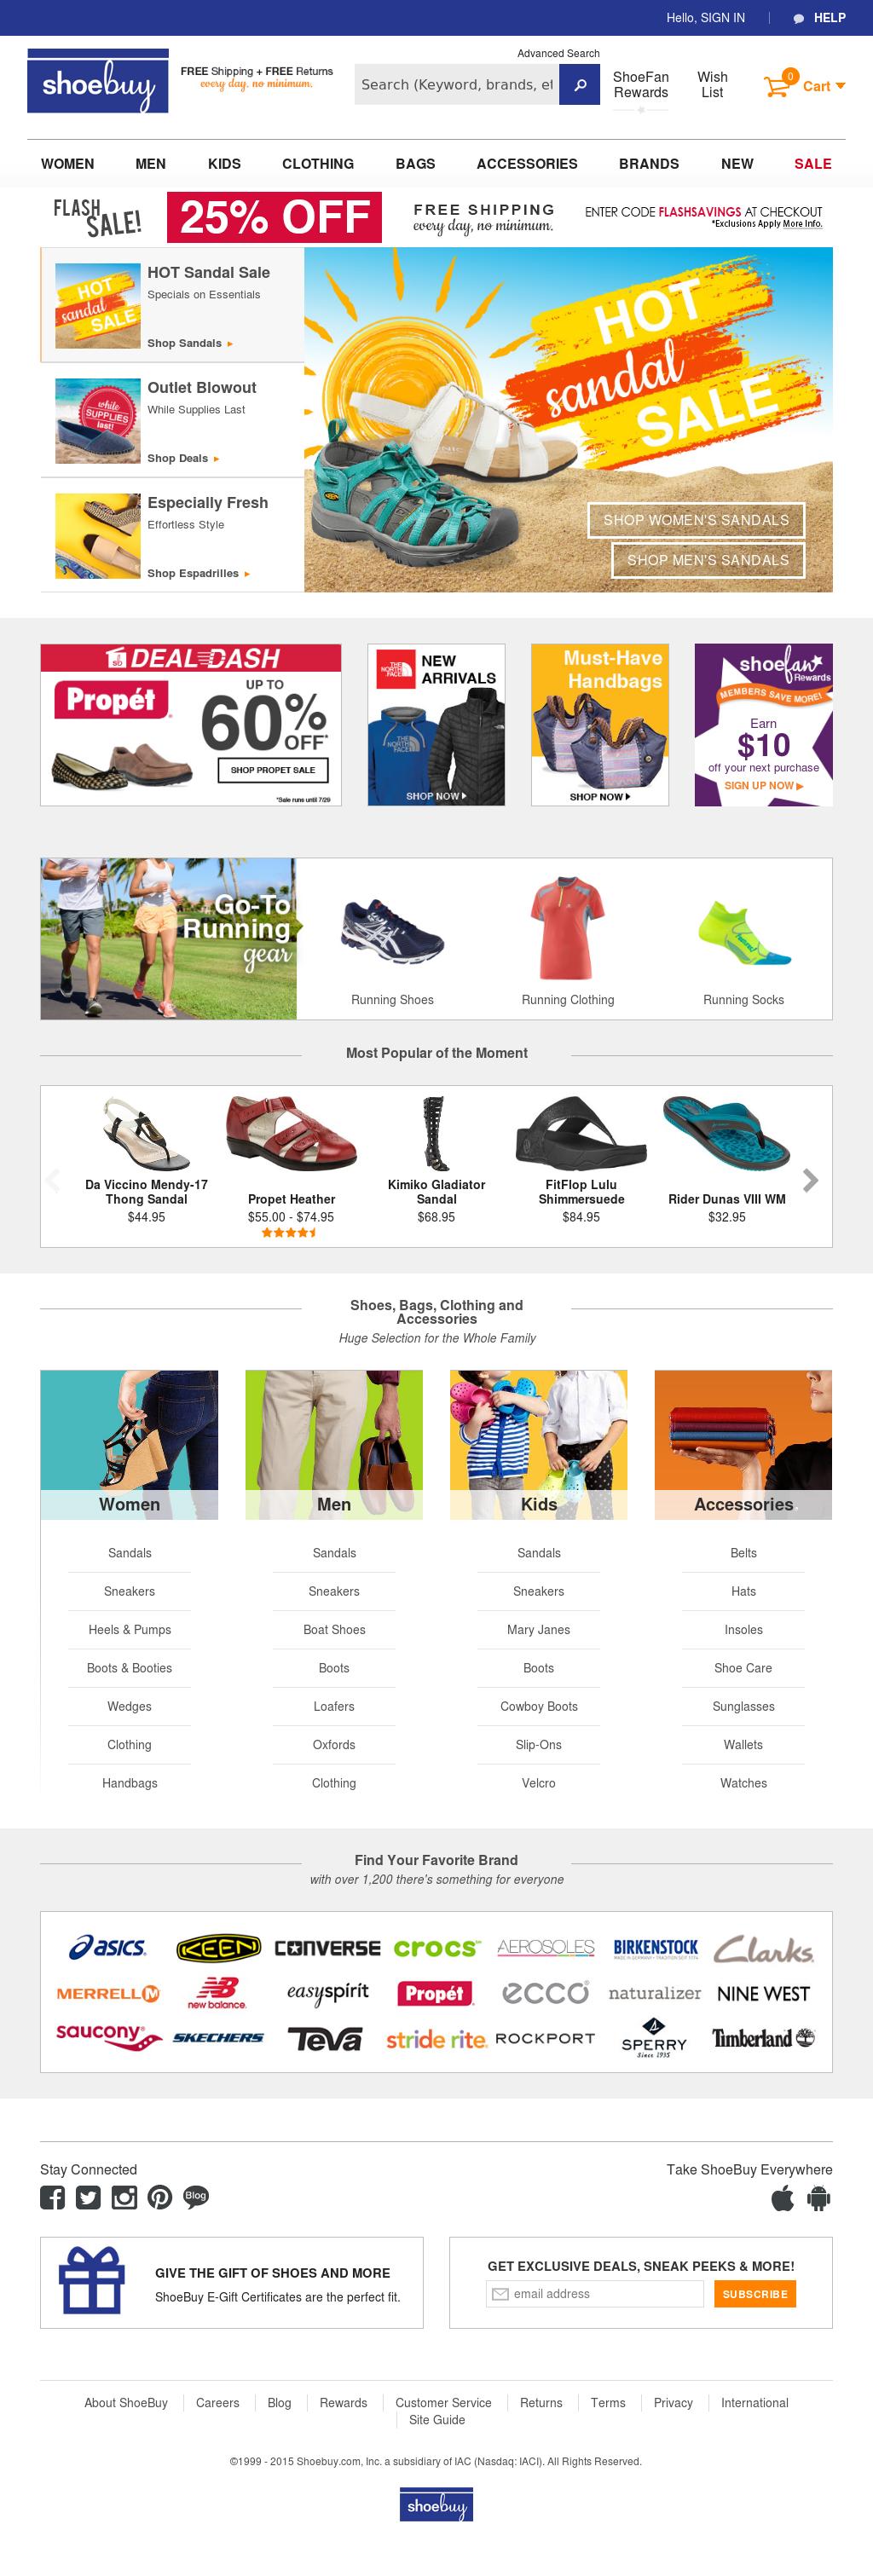 ad87ed579 Shoebuy.com Competitors, Revenue and Employees - Owler Company Profile